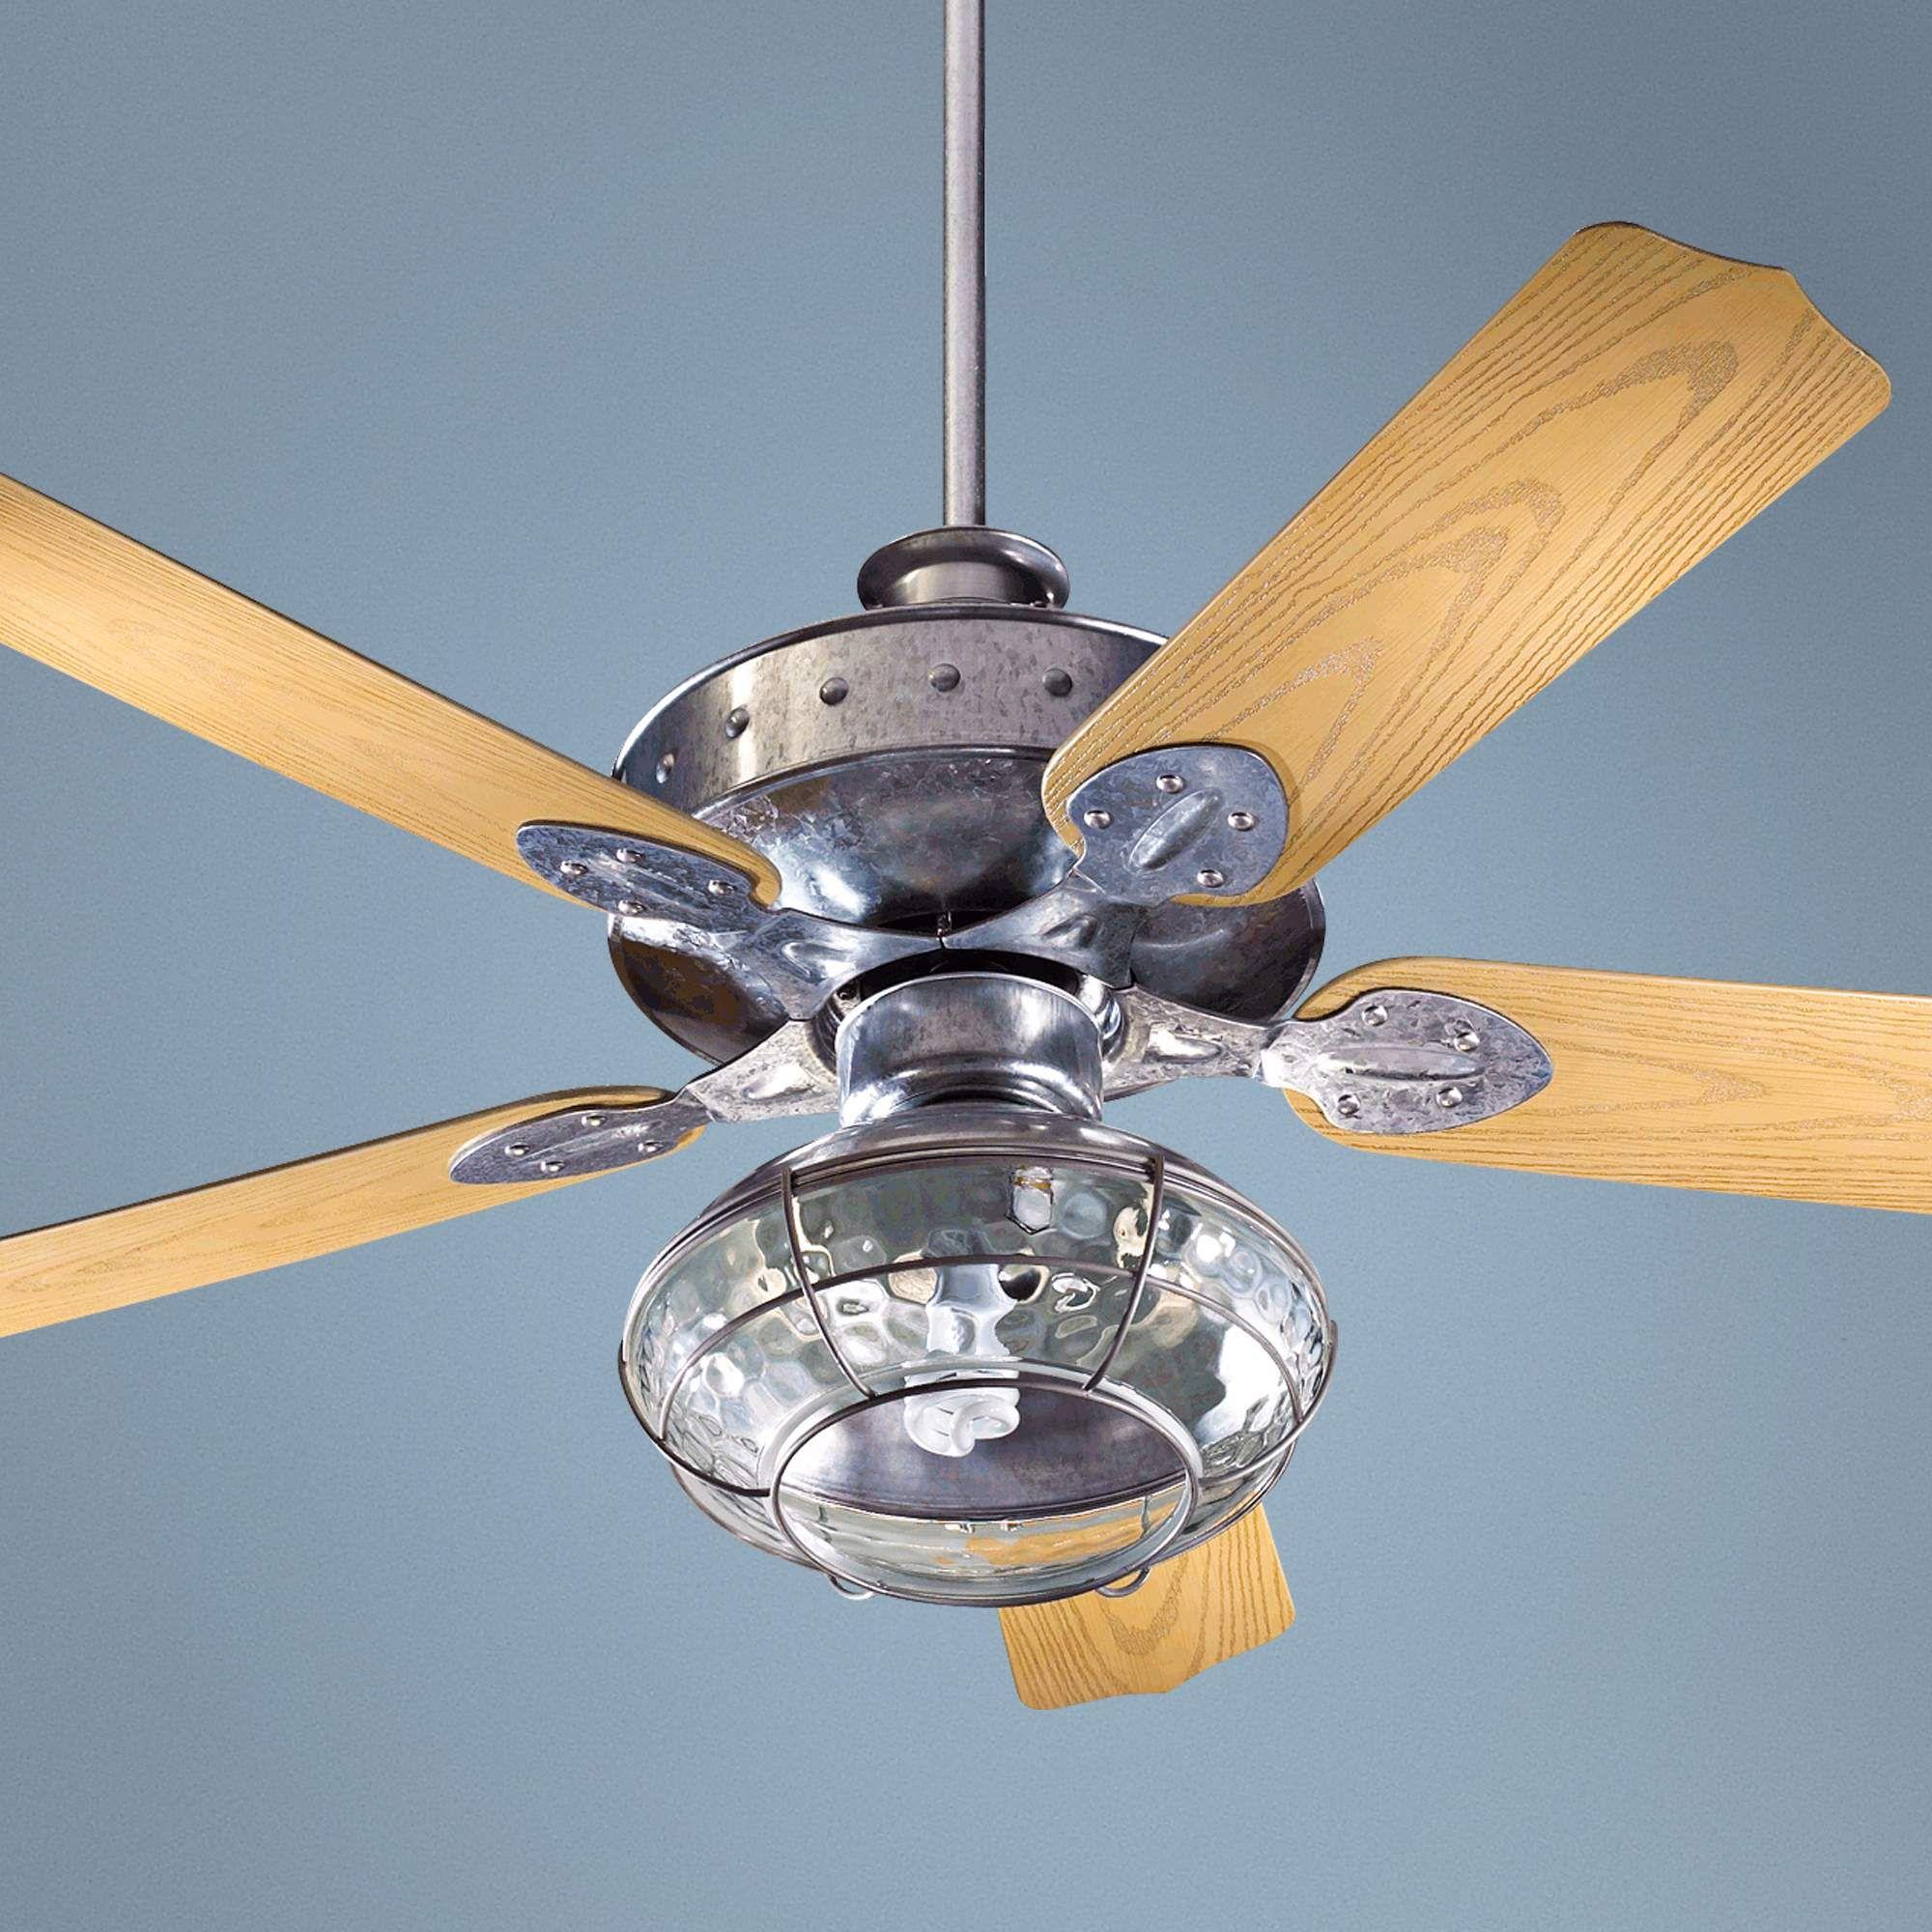 52 quorum hudson galvanized patio ceiling fan with light